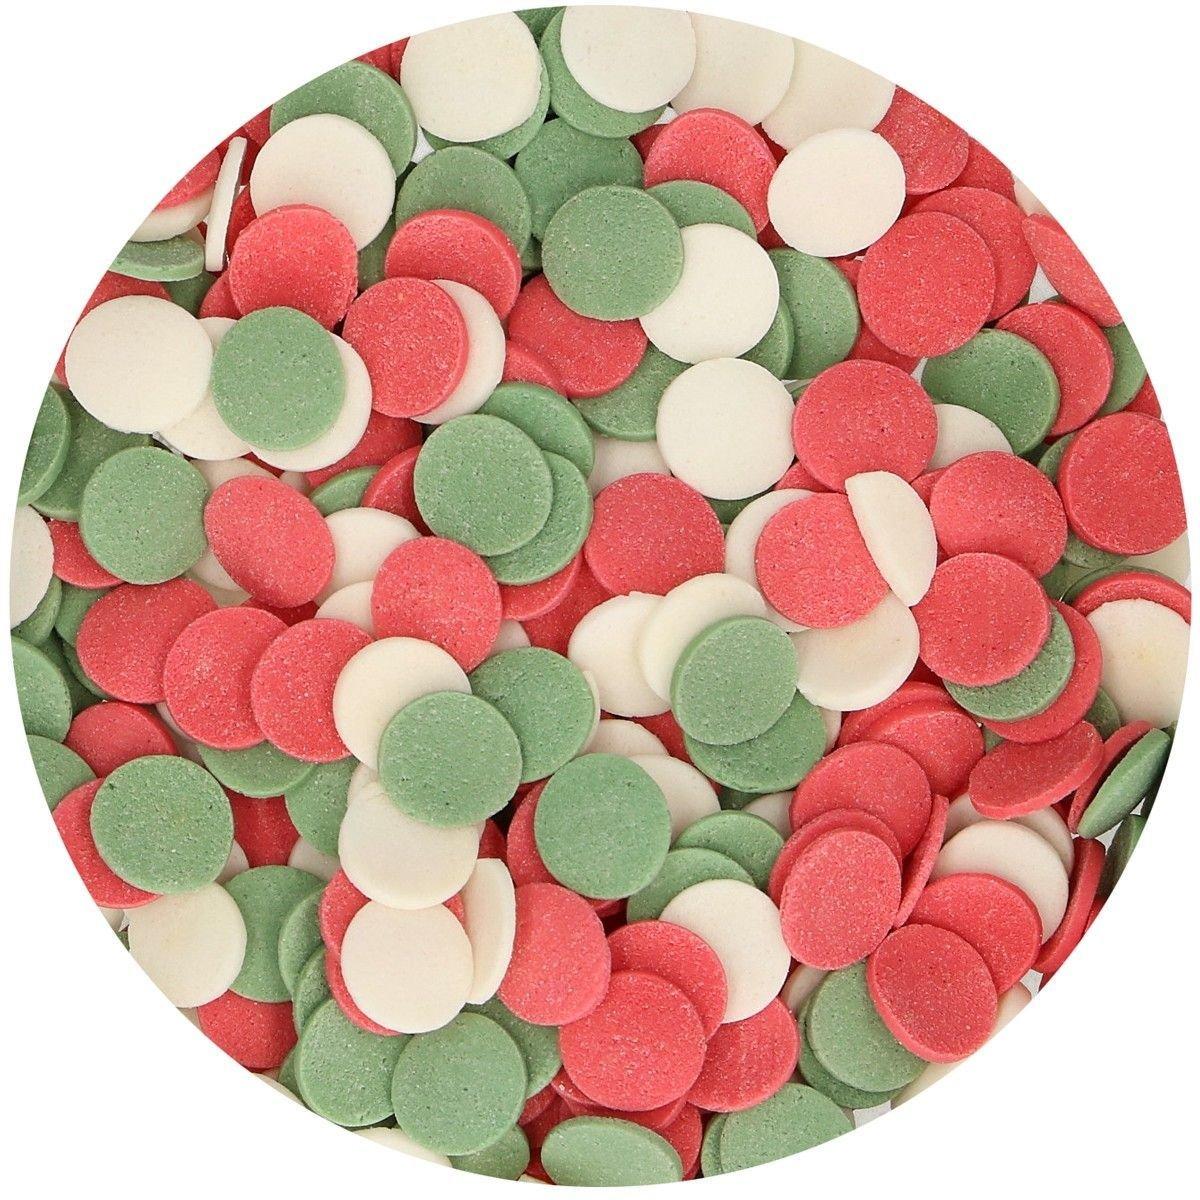 SALE!!! FunCakes Confetti Sprinkles -XL CHRISTMAS -Κονφετί XL Χριστούγεννα 55γρ-ΑΝΑΛΩΣΗ ΚΑΤΑ ΠΡΟΤΙΜΗΣΗ 9/2020